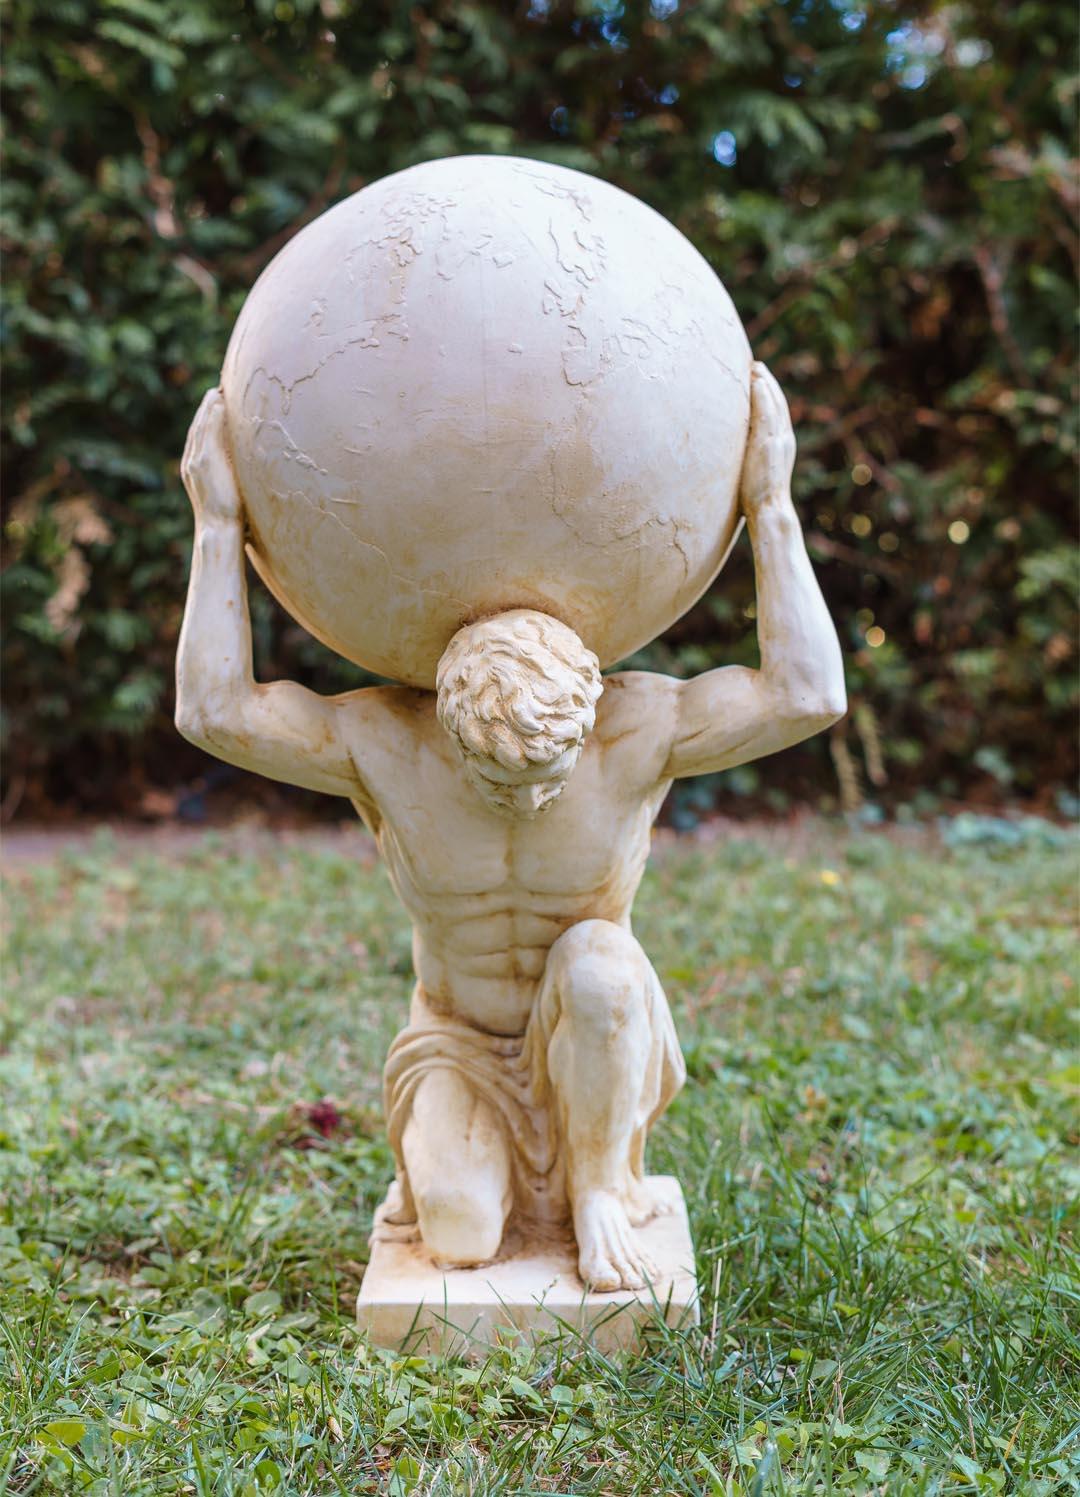 Full Size of Xl Atlas Titan Weltkugel Skulptur Figur Statue Garten Haus Antik Spielhaus Kunststoff Feuerstelle Pavillon Schaukelstuhl Loungemöbel Holz Liegestuhl Wohnzimmer Skulptur Garten